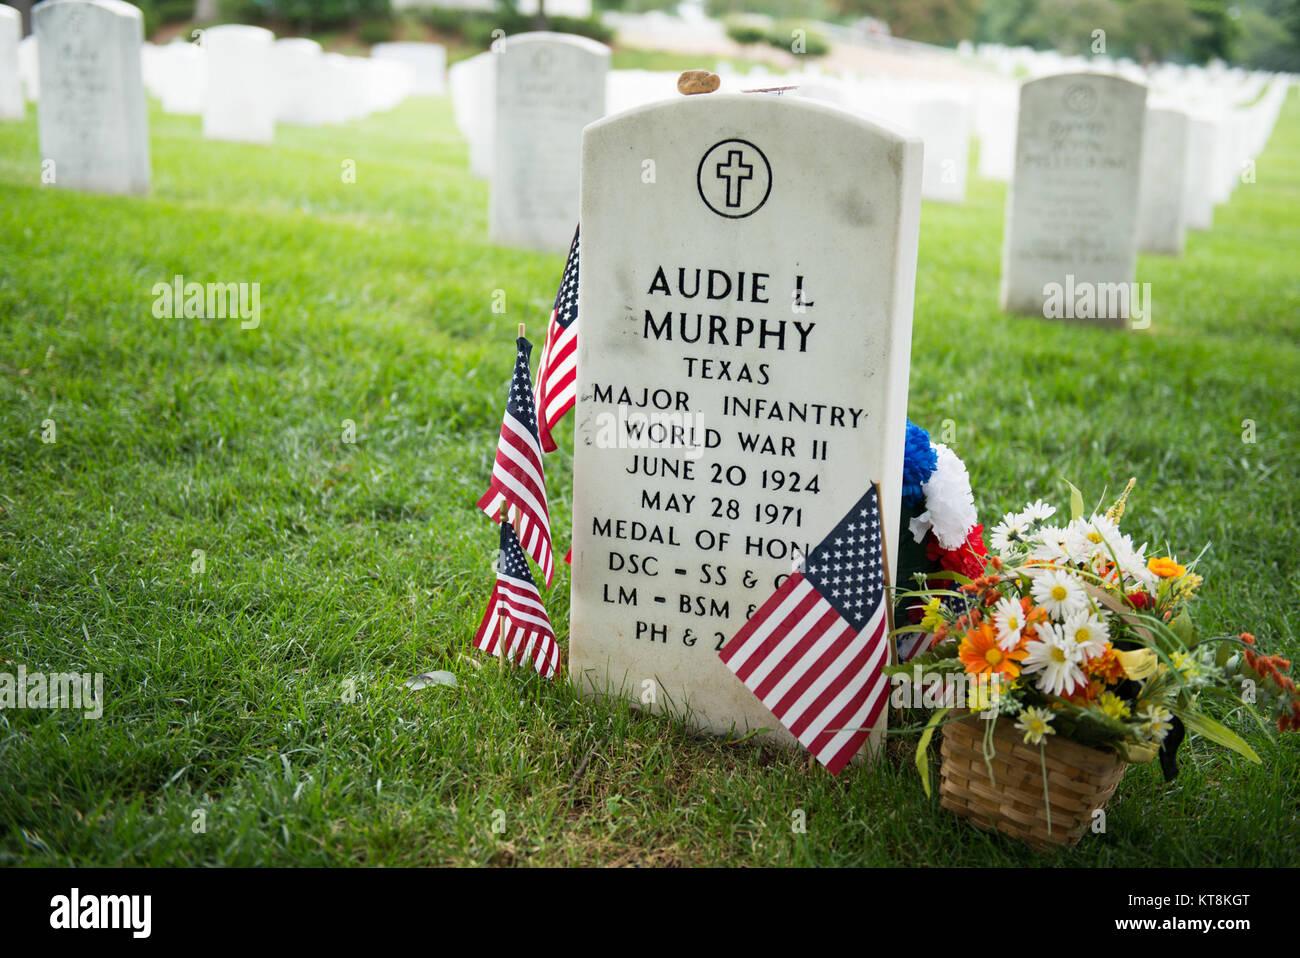 audie murphy grave stock photos audie murphy grave stock images